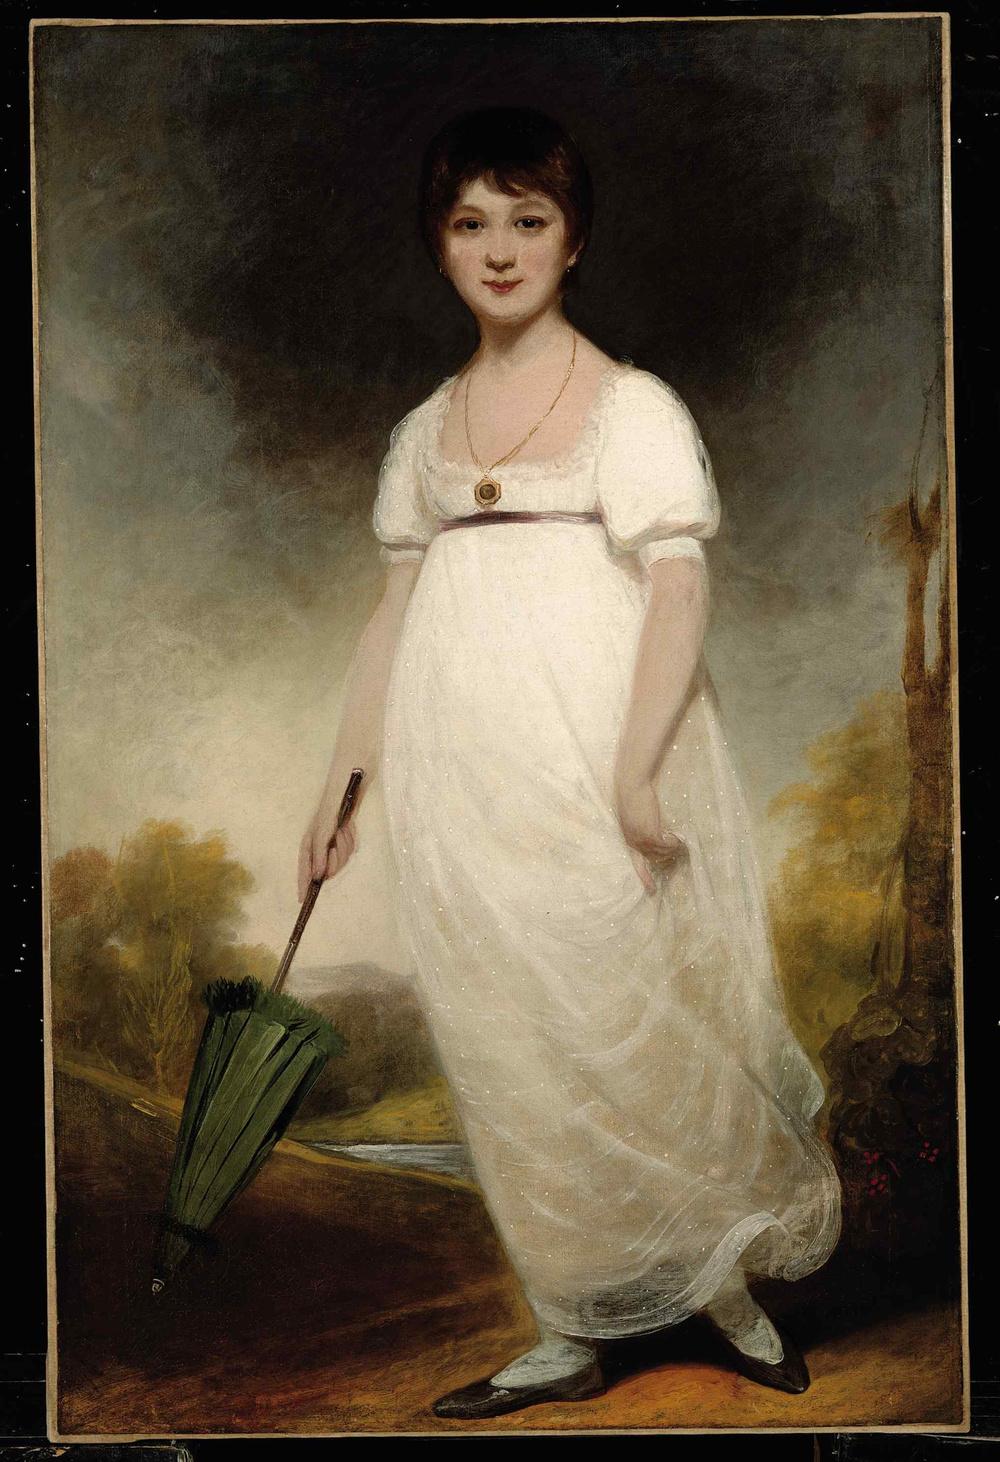 Rice Portrait of Jane Austen